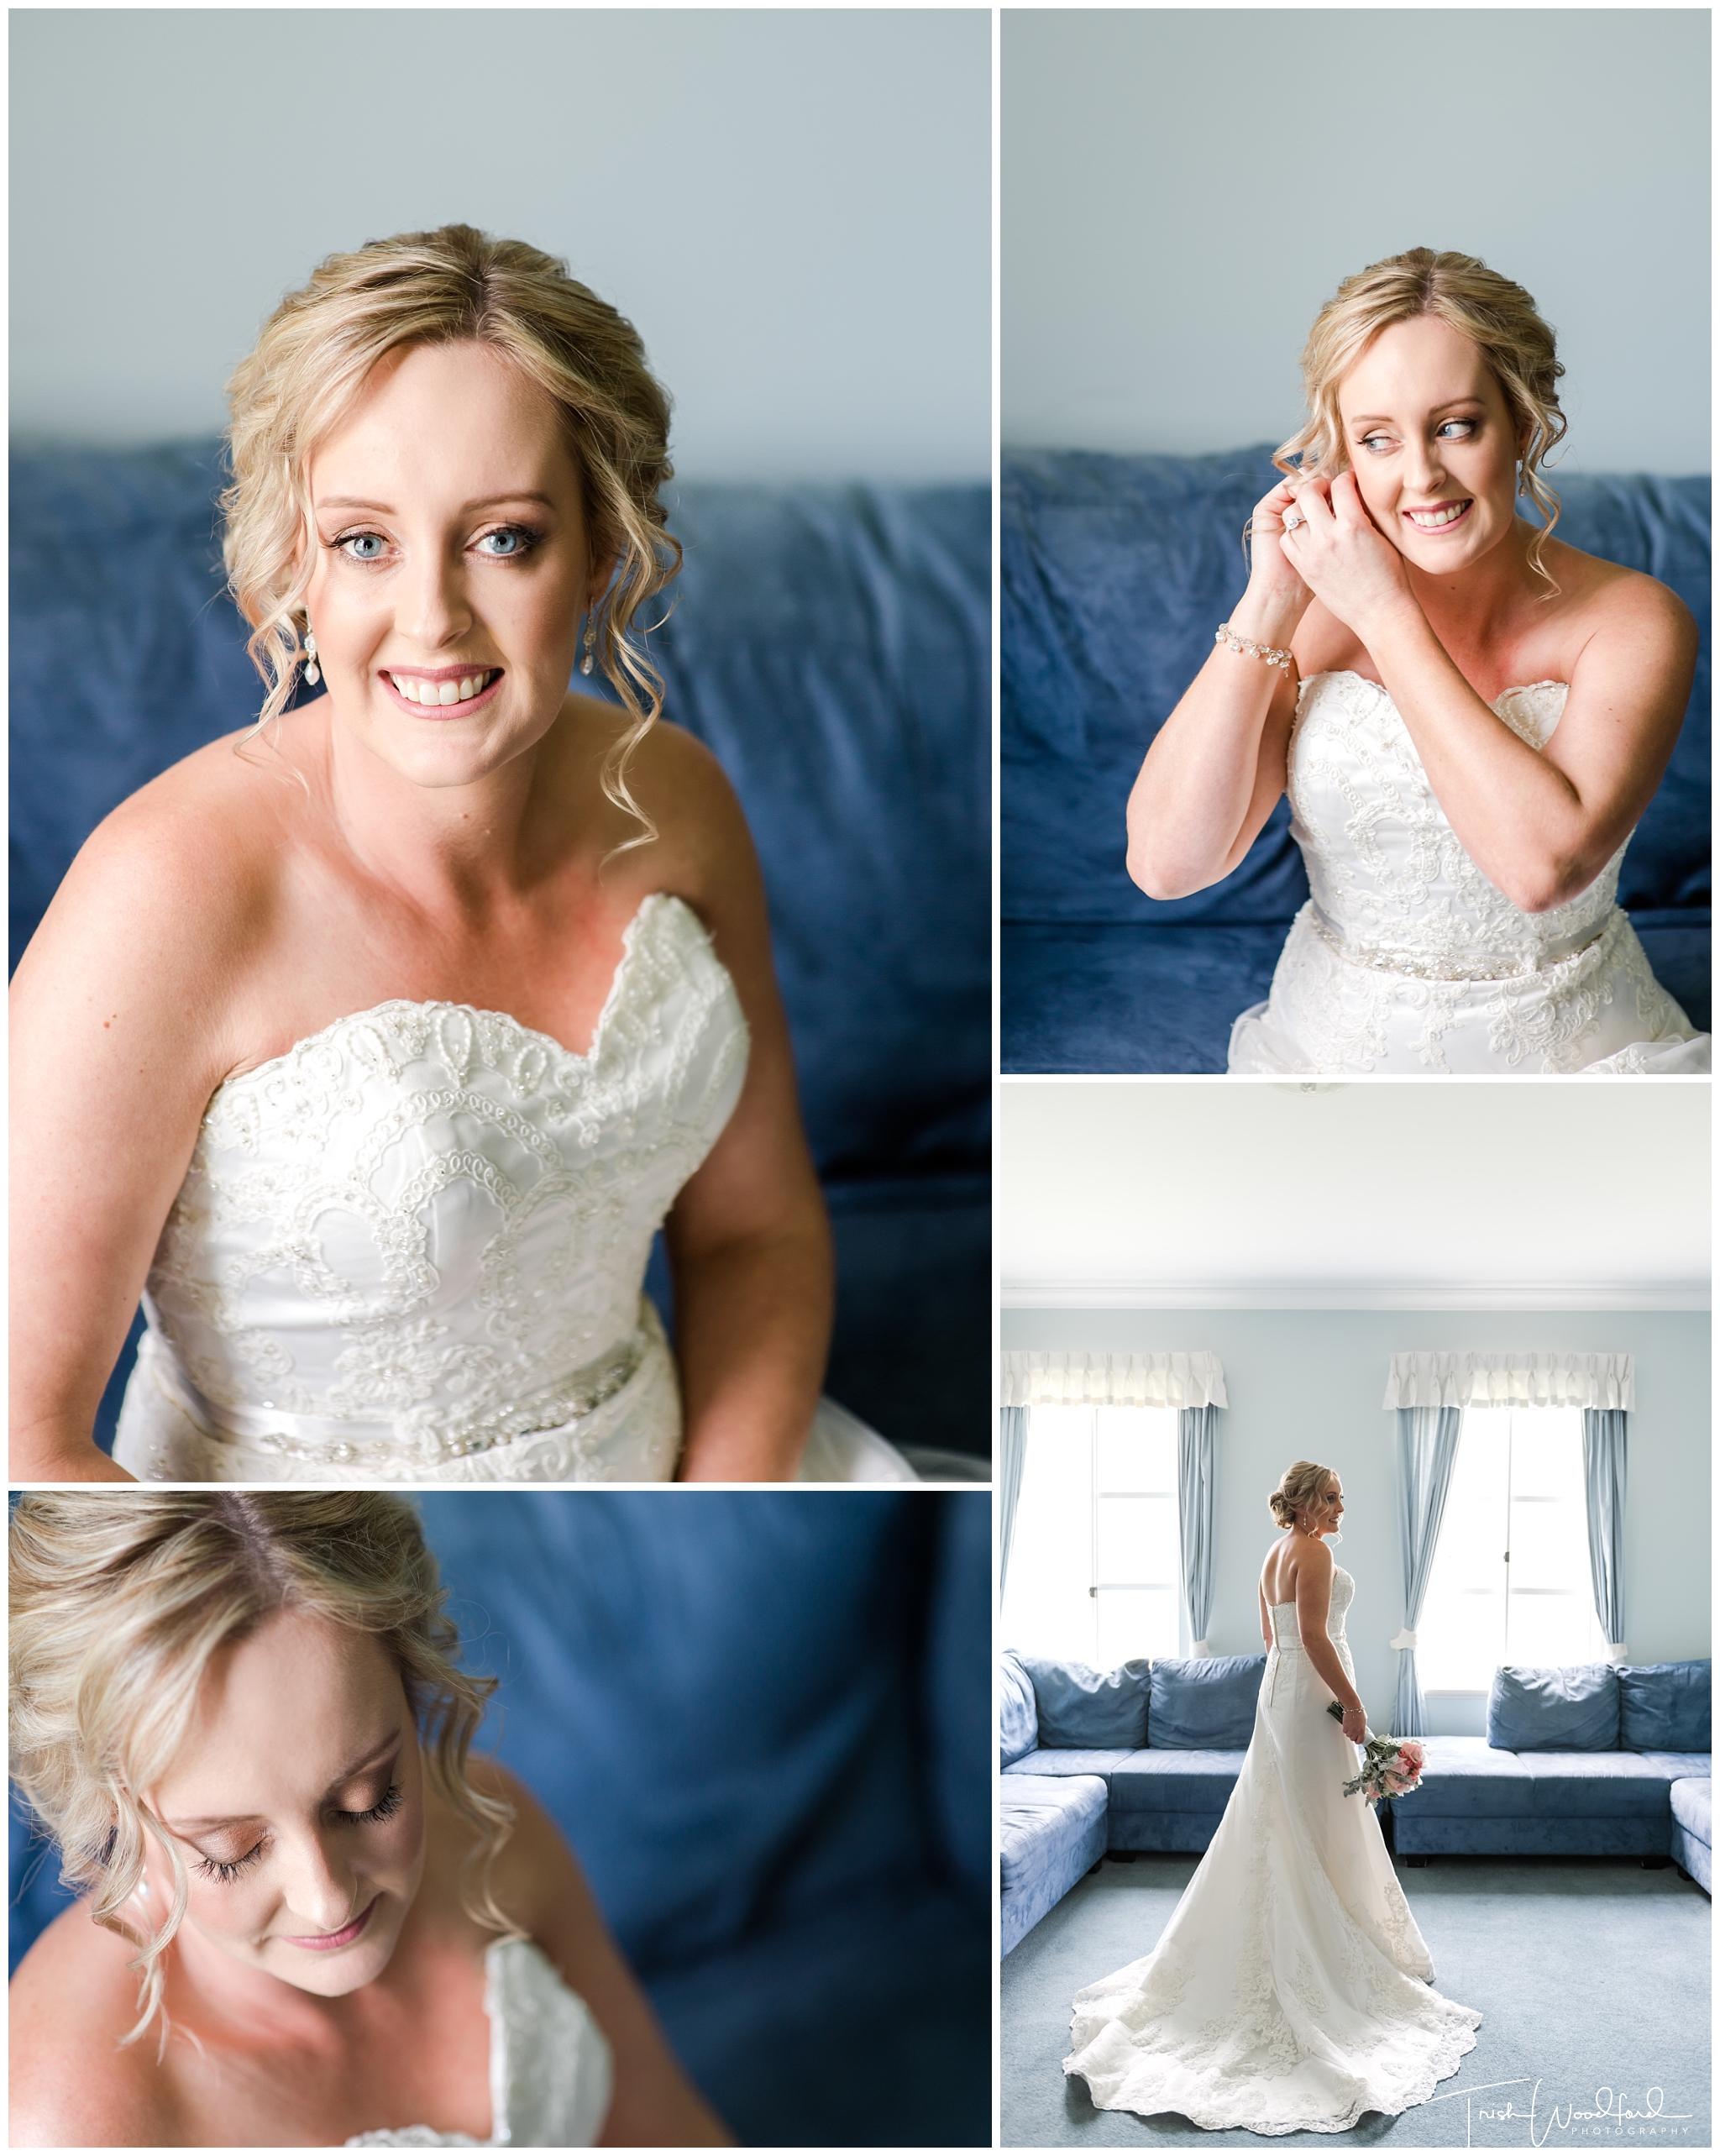 Peel Manor House Wedding Bridal Portrait